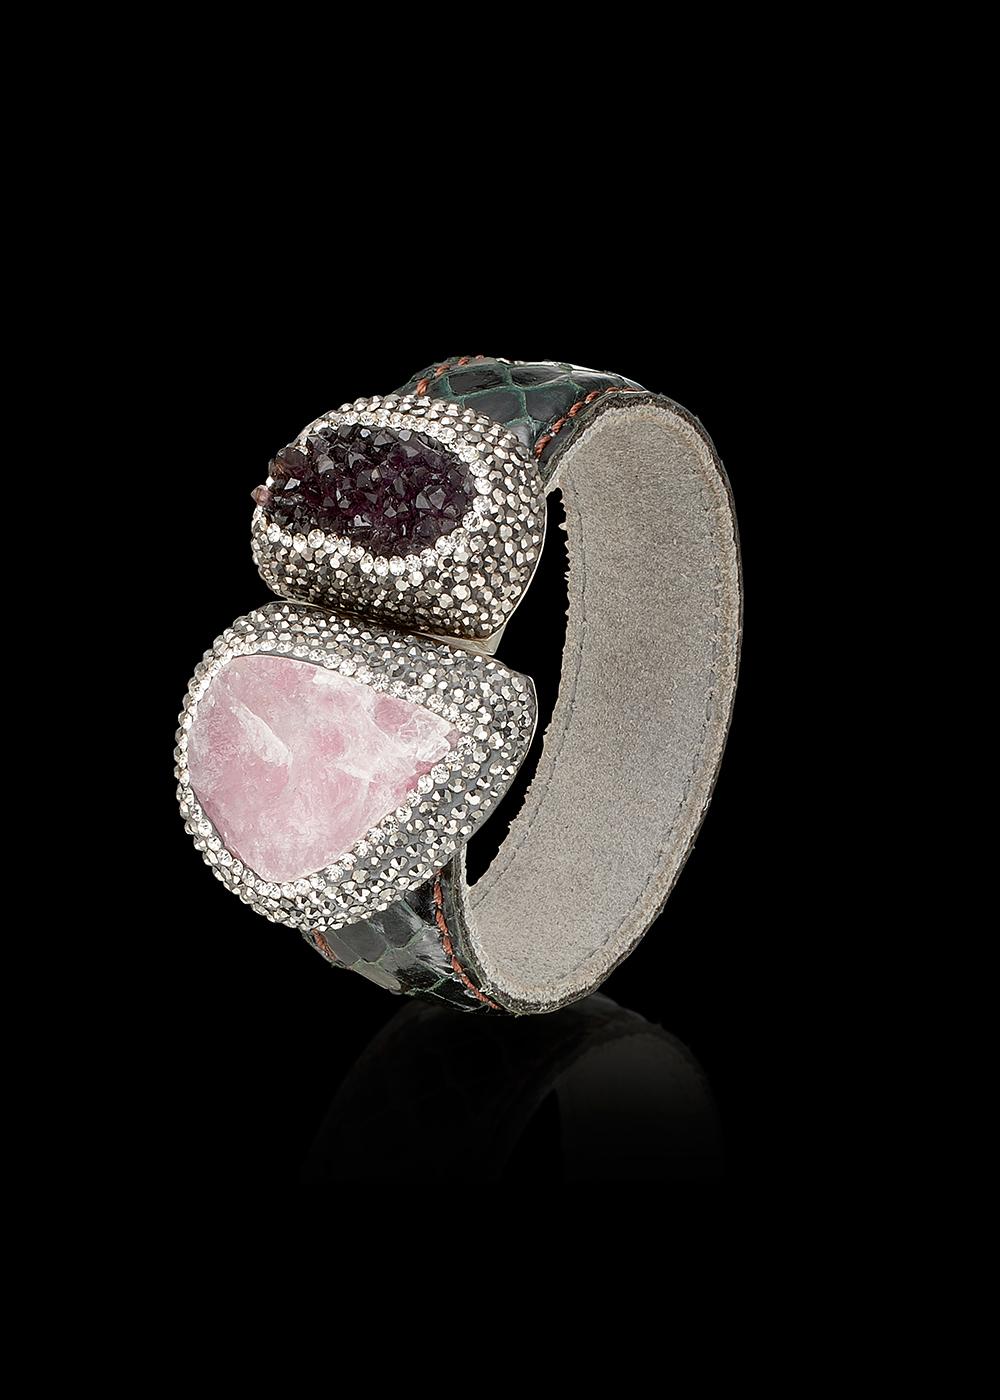 GERONIMO bracelet with Rose Quartz, Amethyst, Swarowski Crystals and Snakeskin. Kr. 1995,- $ 280